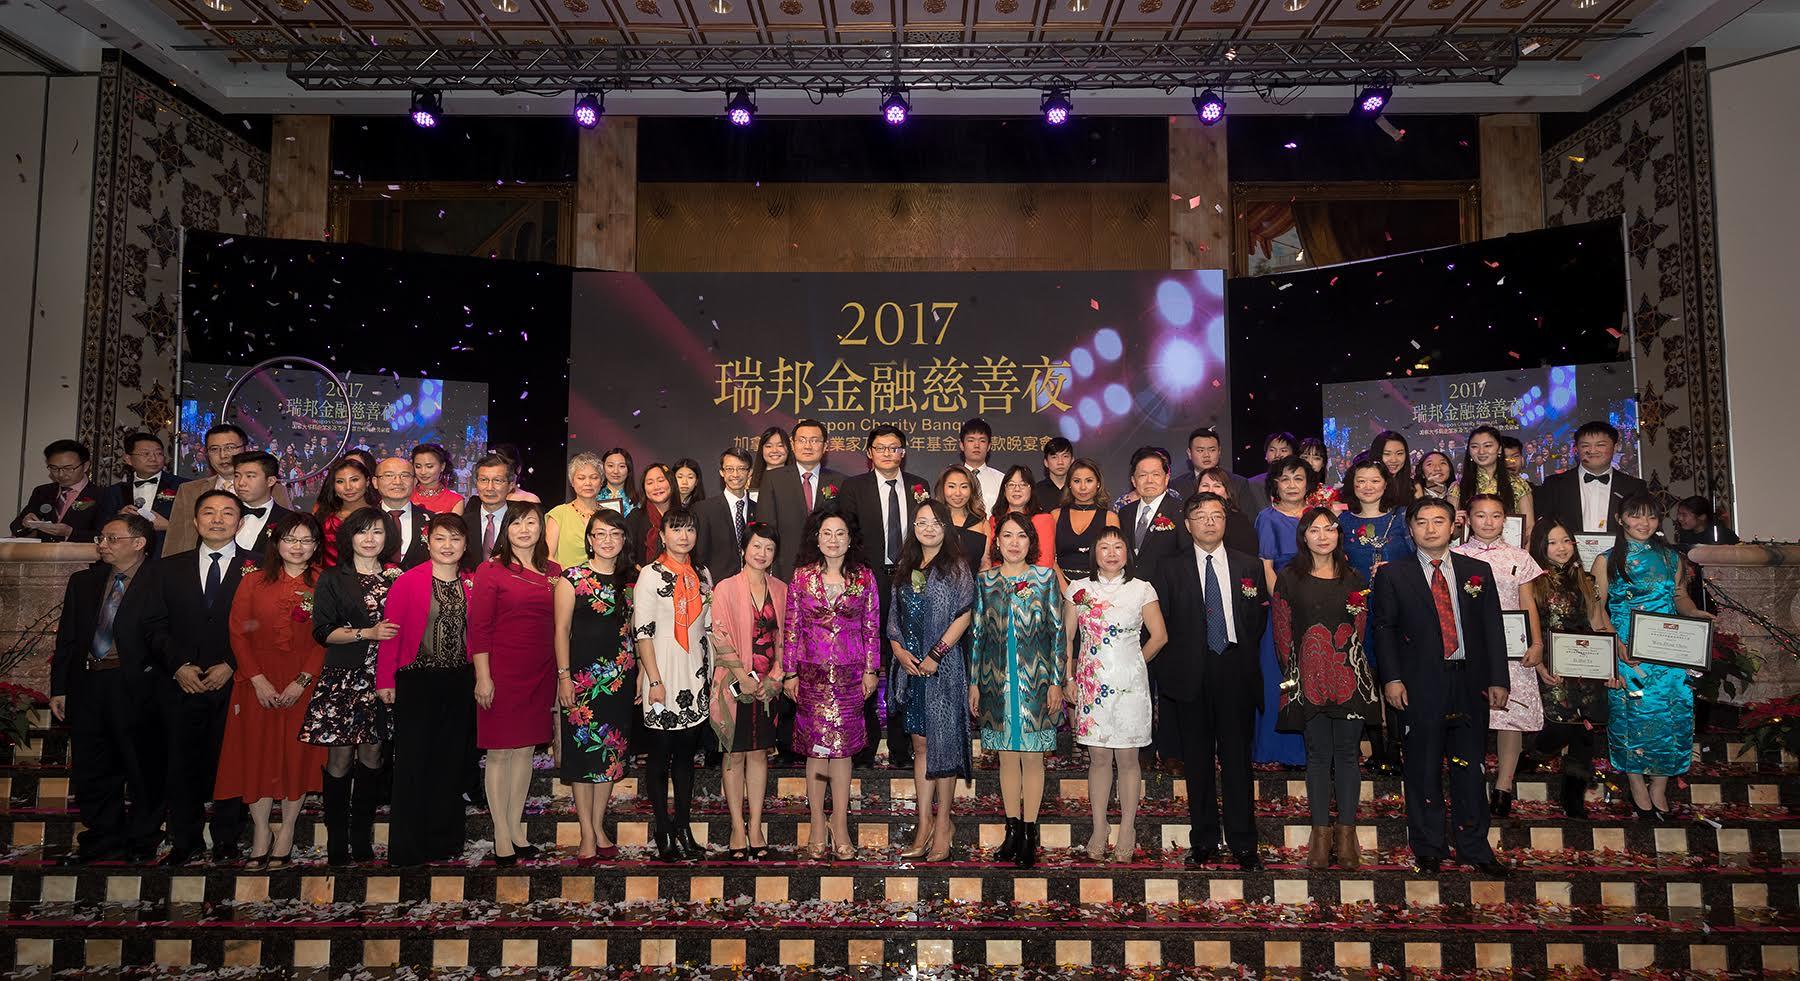 2017 Respon Charity Banquet